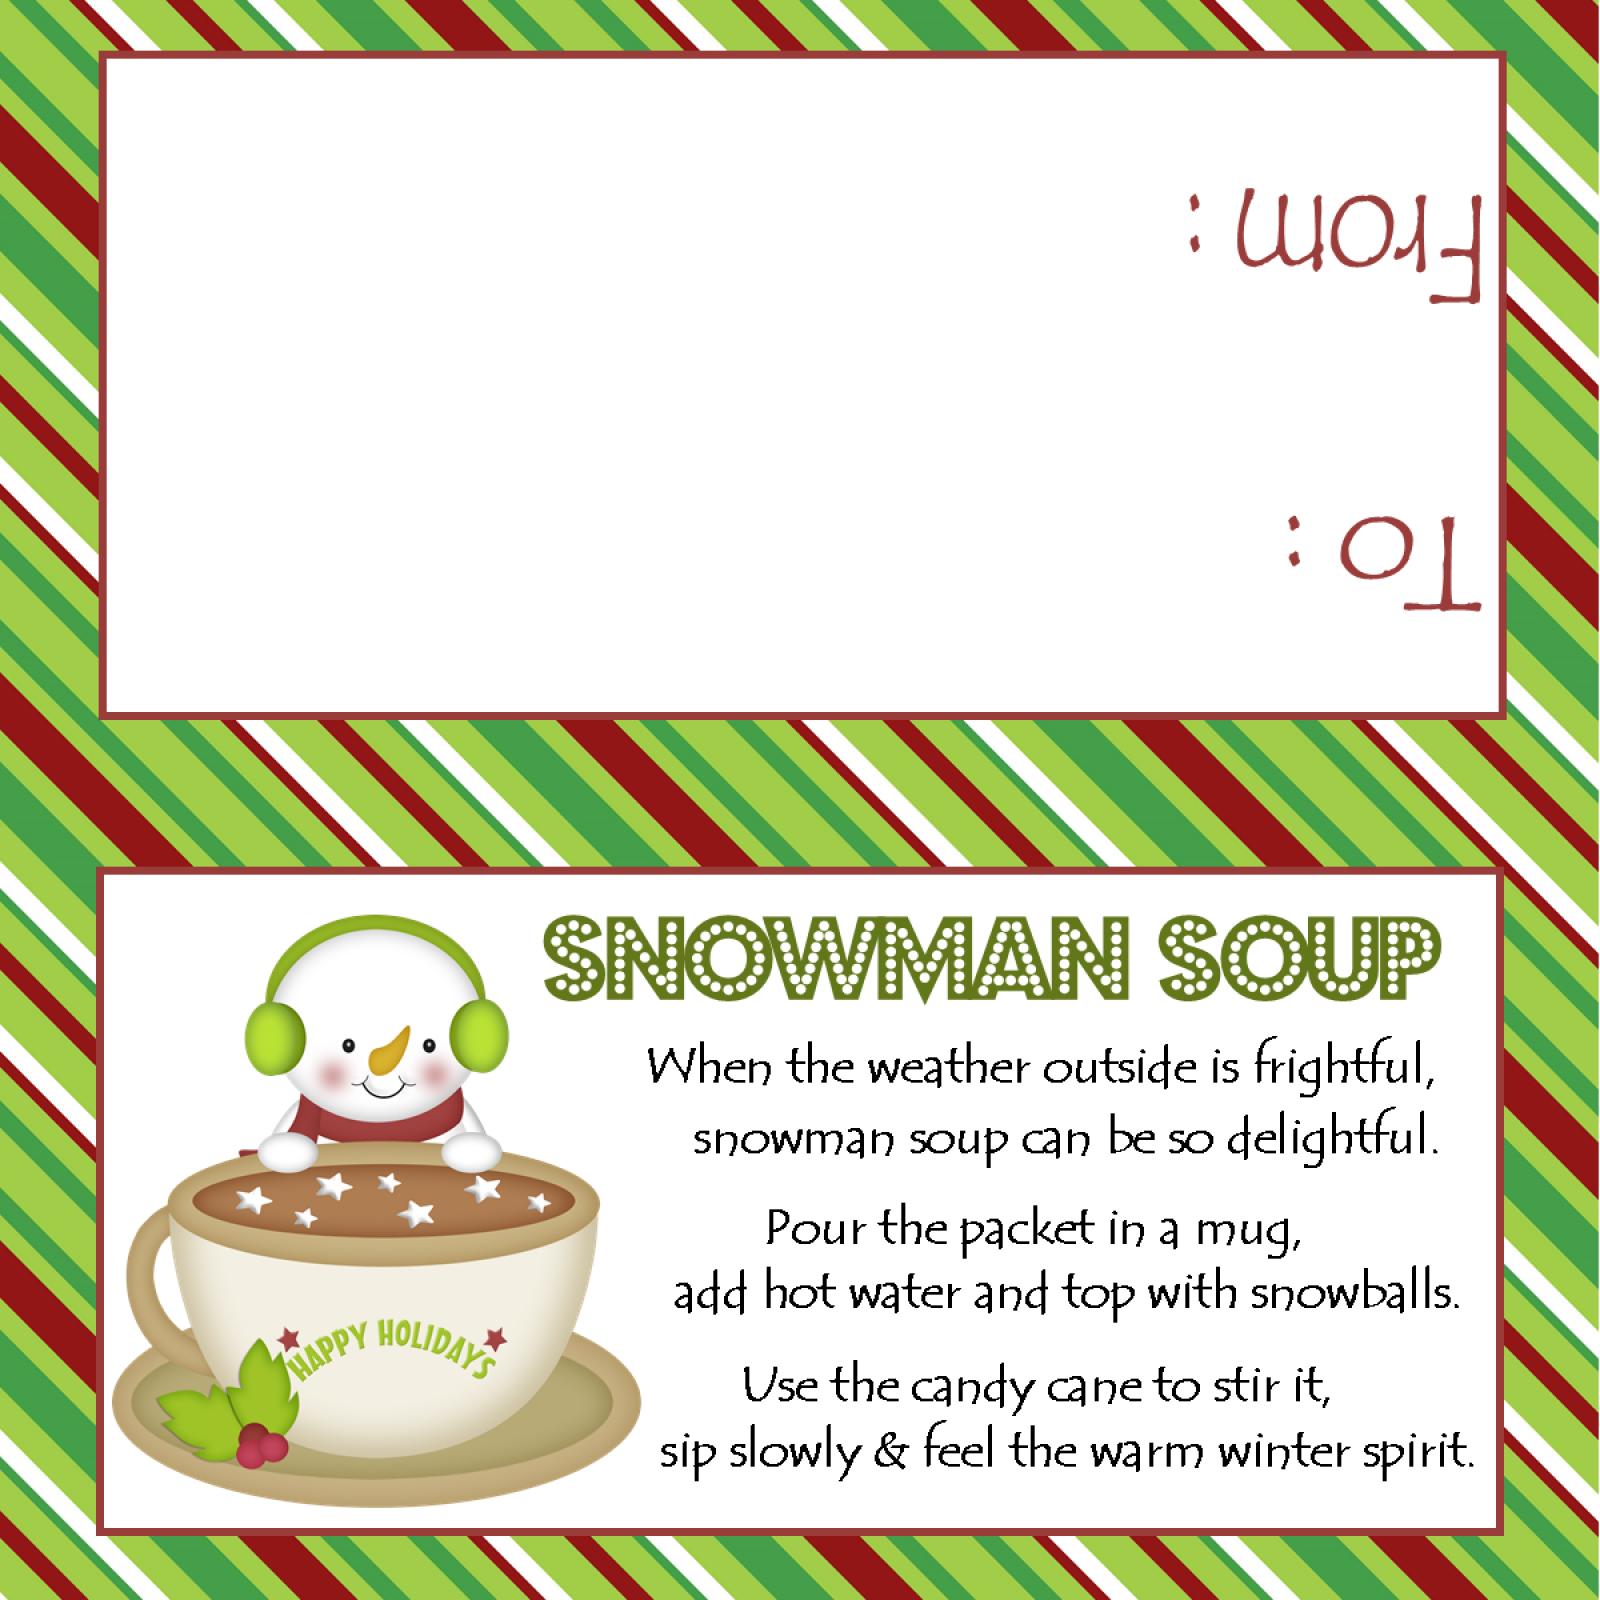 photograph about Snowman Soup Printable identify Snowman Soup - Address Bag Topper - Electronic Record - Yourself print!